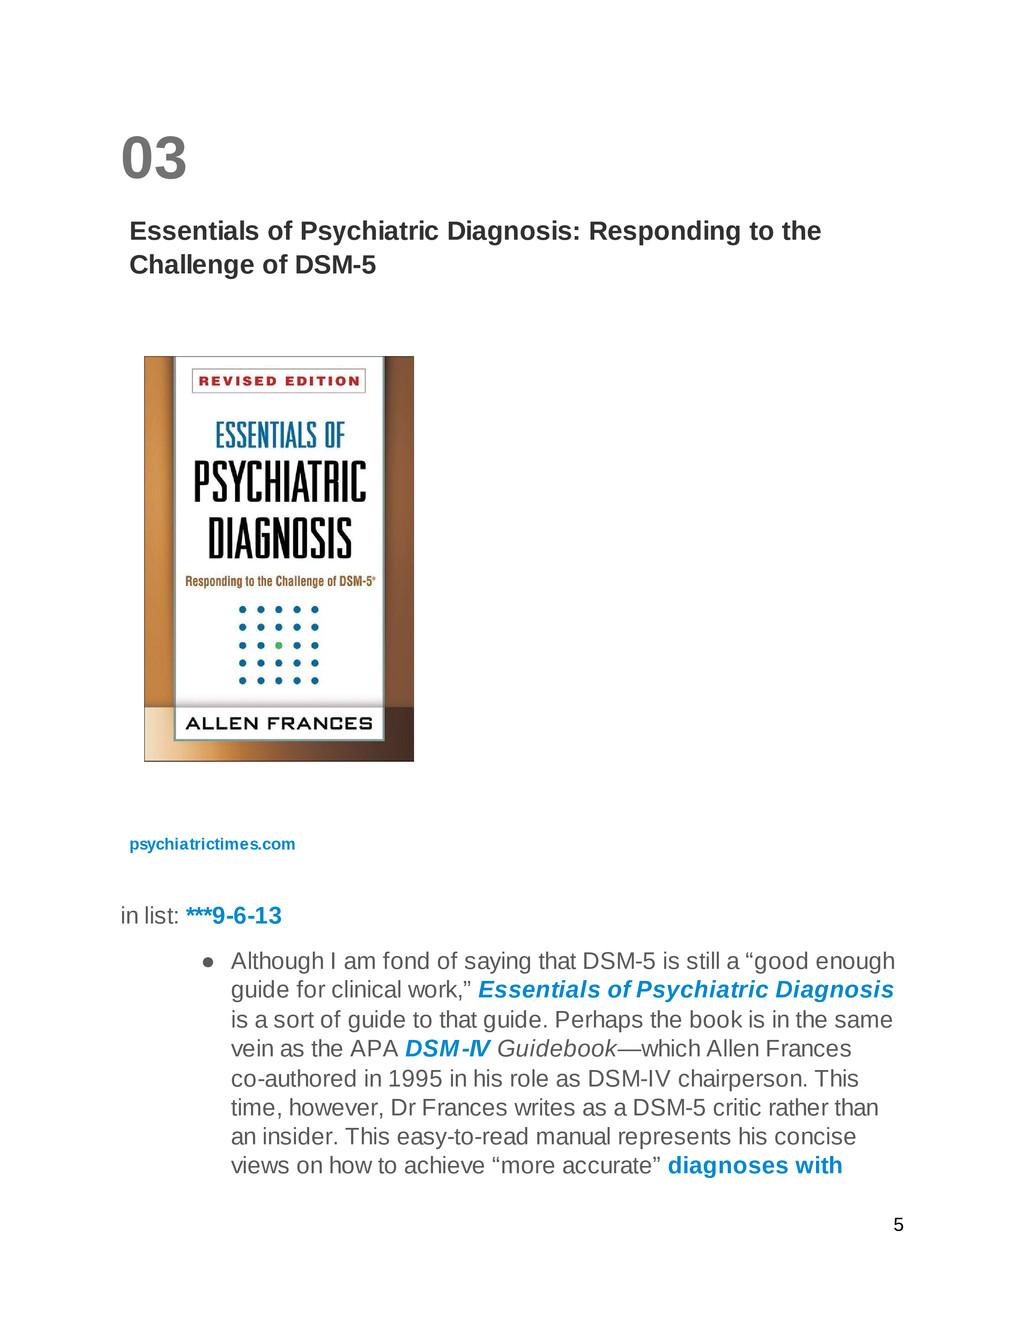 03 Essentials of Psychiatric Diagnosis: Respond...